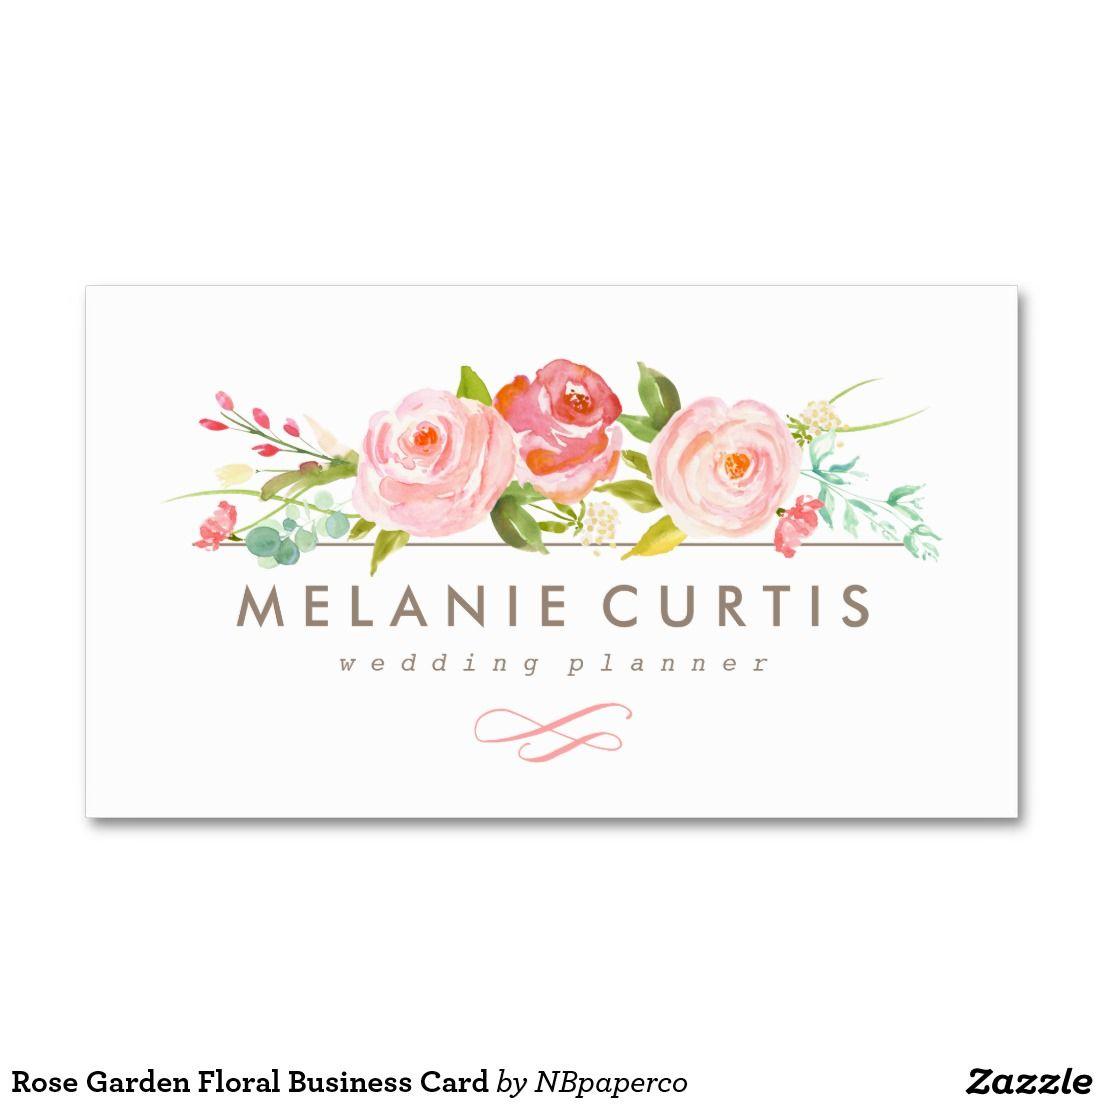 Rose garden floral business card tarjetas pinterest rose garden floral business card magicingreecefo Image collections